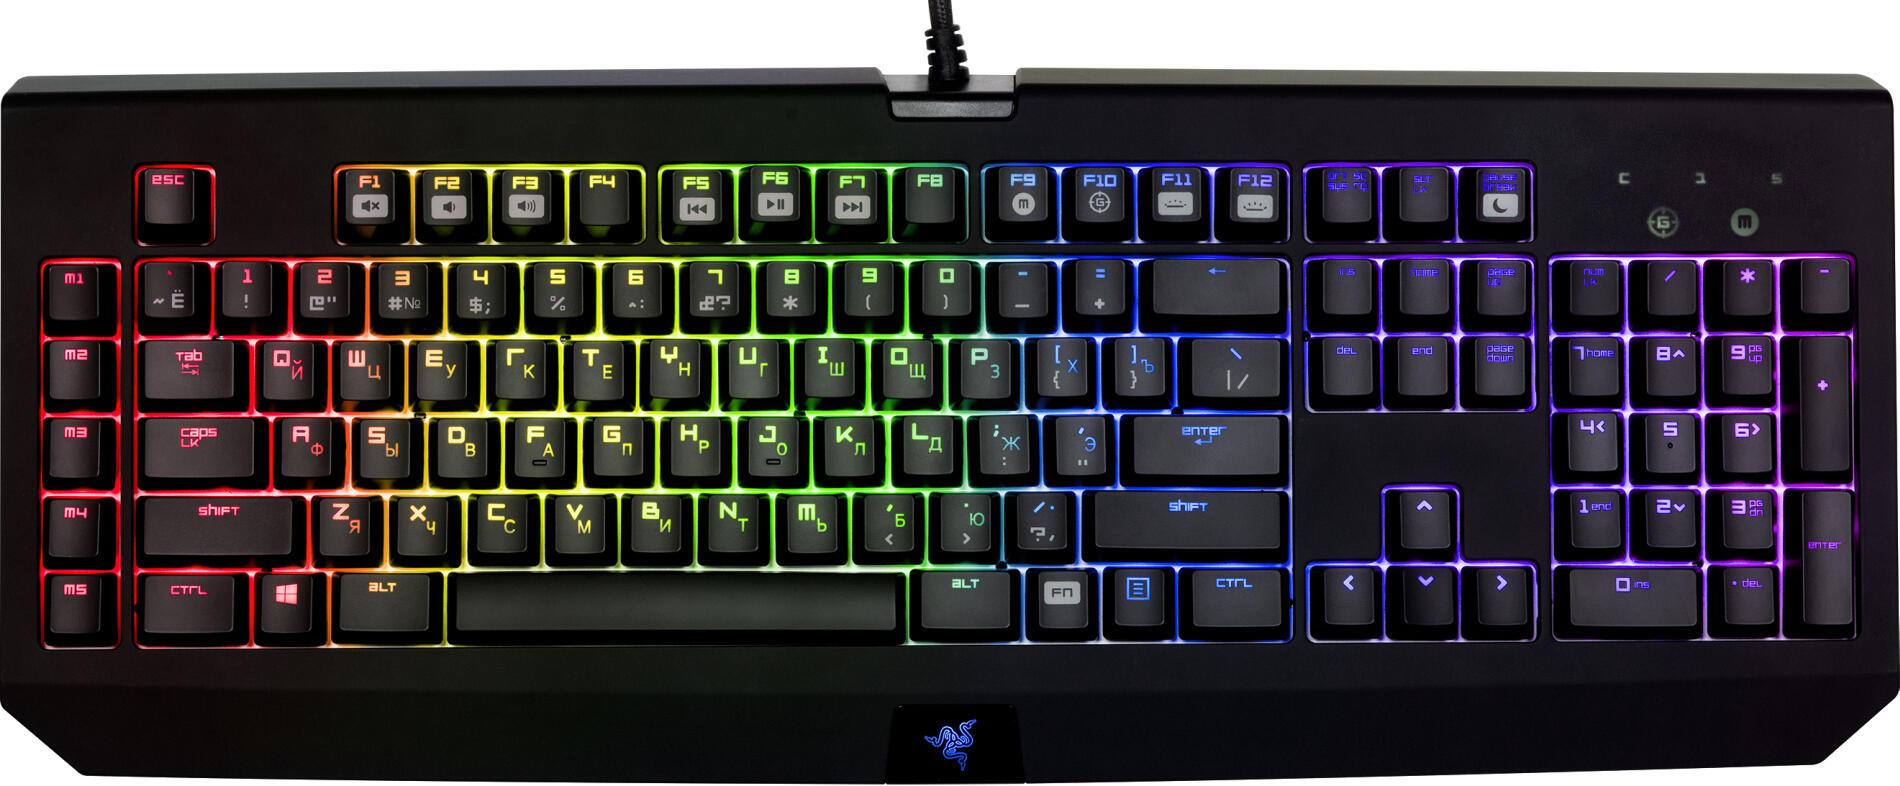 Клавиатура компьютера раскладка фото назначение клавиш